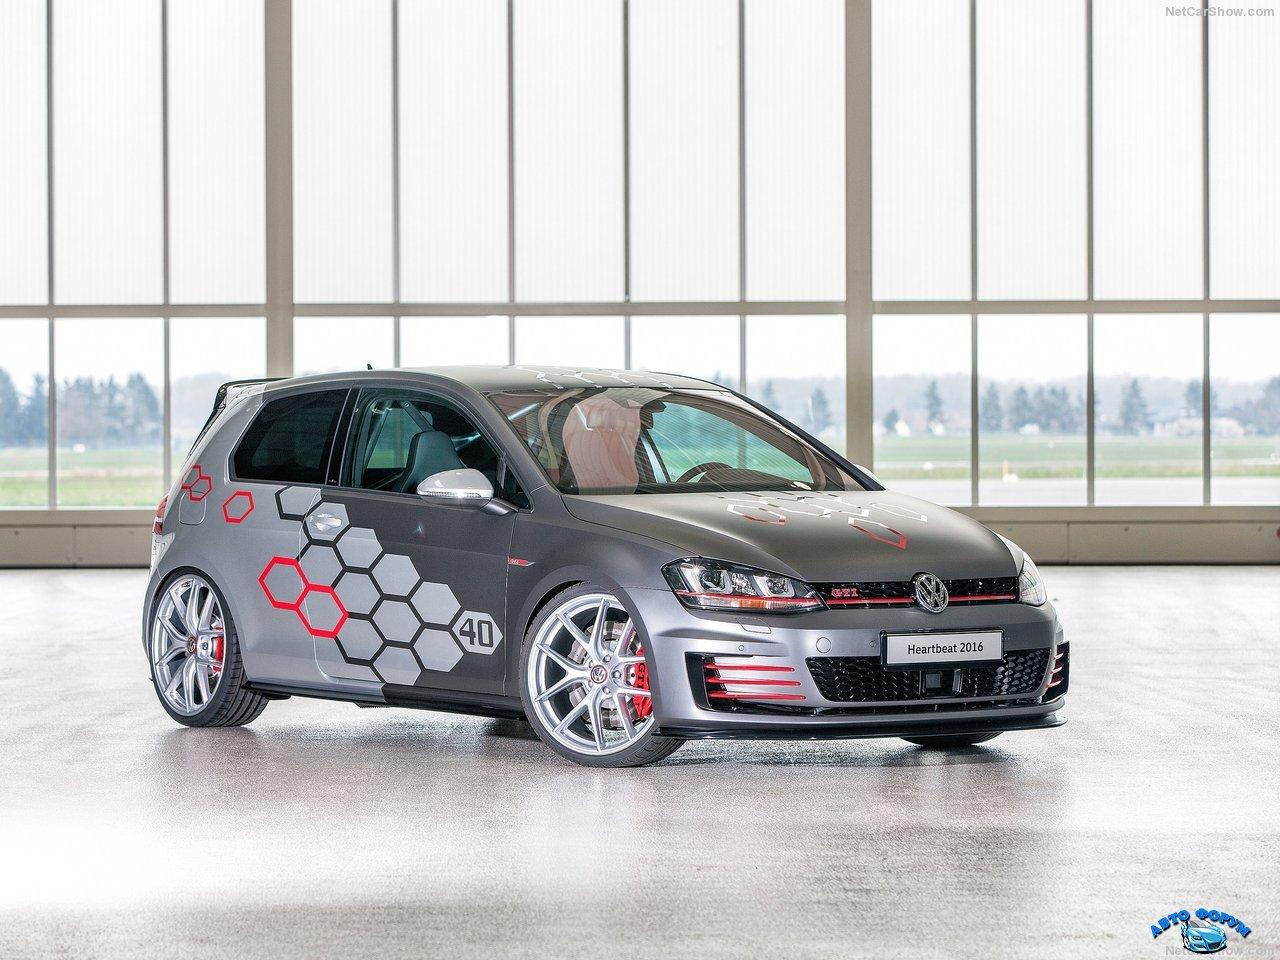 Volkswagen-Golf_GTI_Heartbeat_Concept-2016-1280-01.jpg